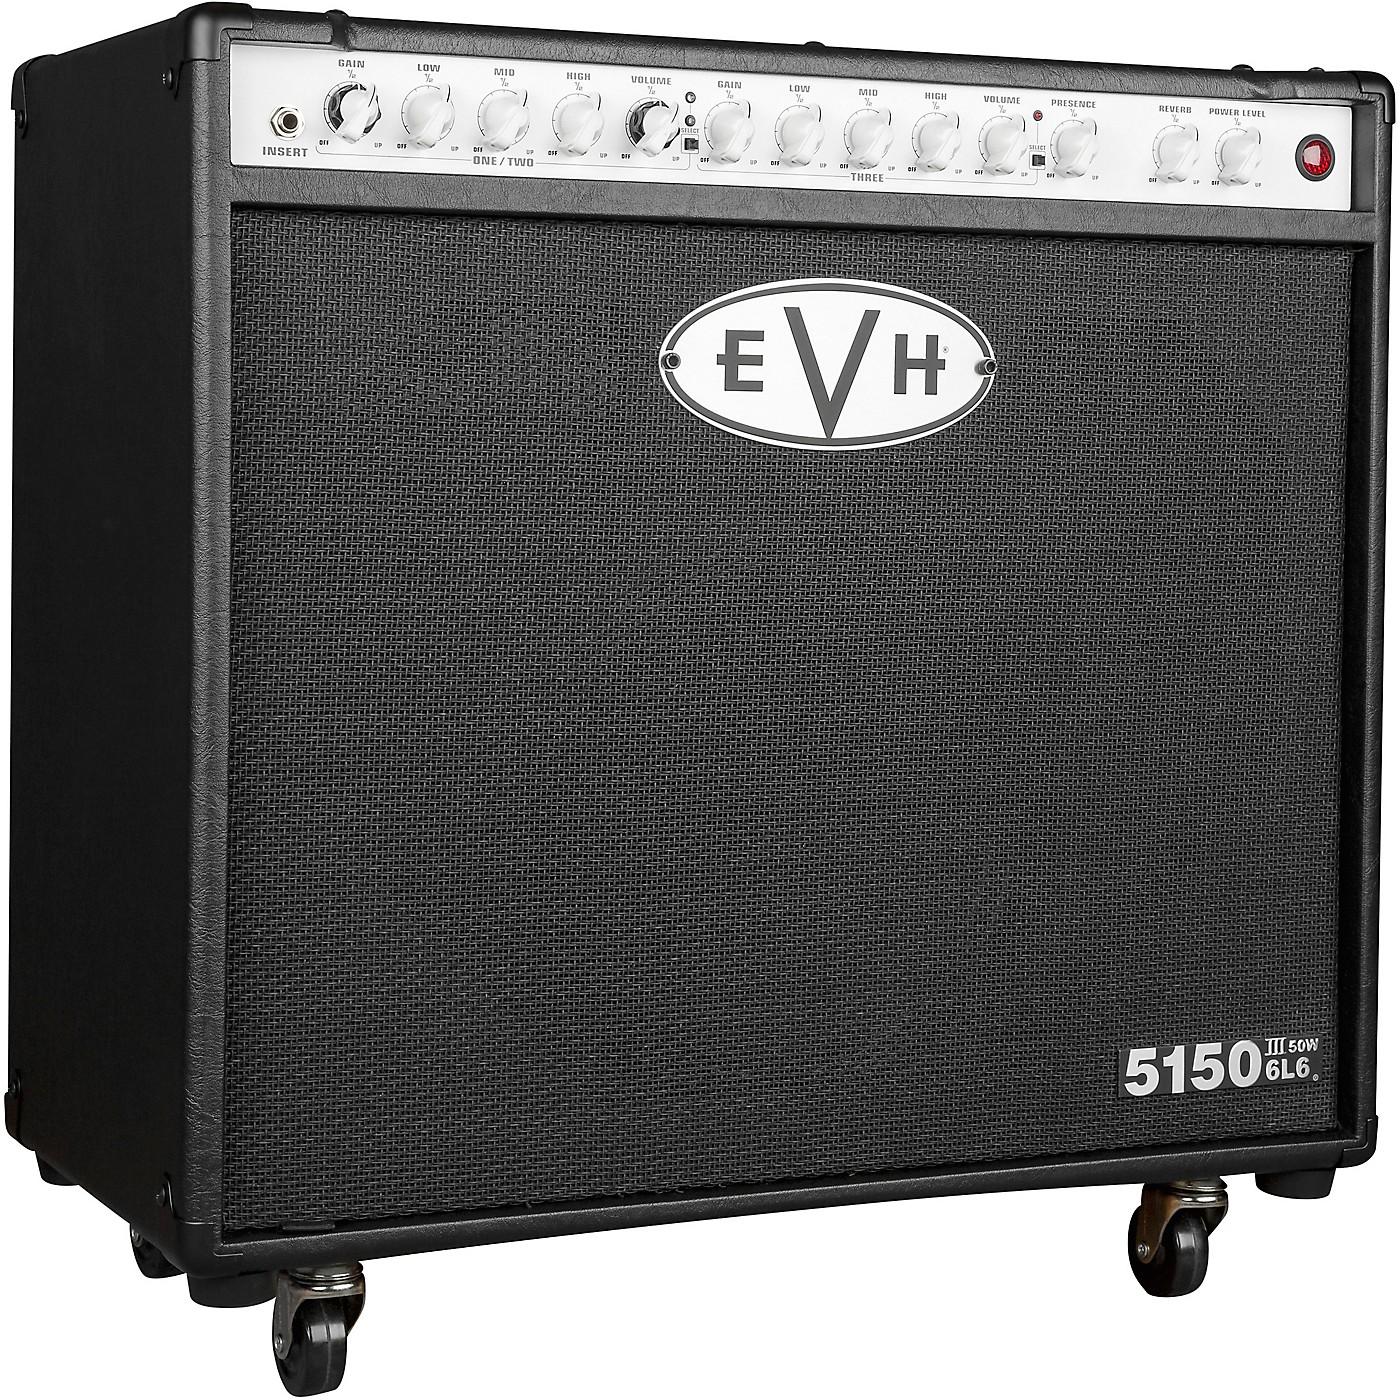 EVH 5150III 50W 1x12 6L6 Tube Guitar Combo Amp thumbnail